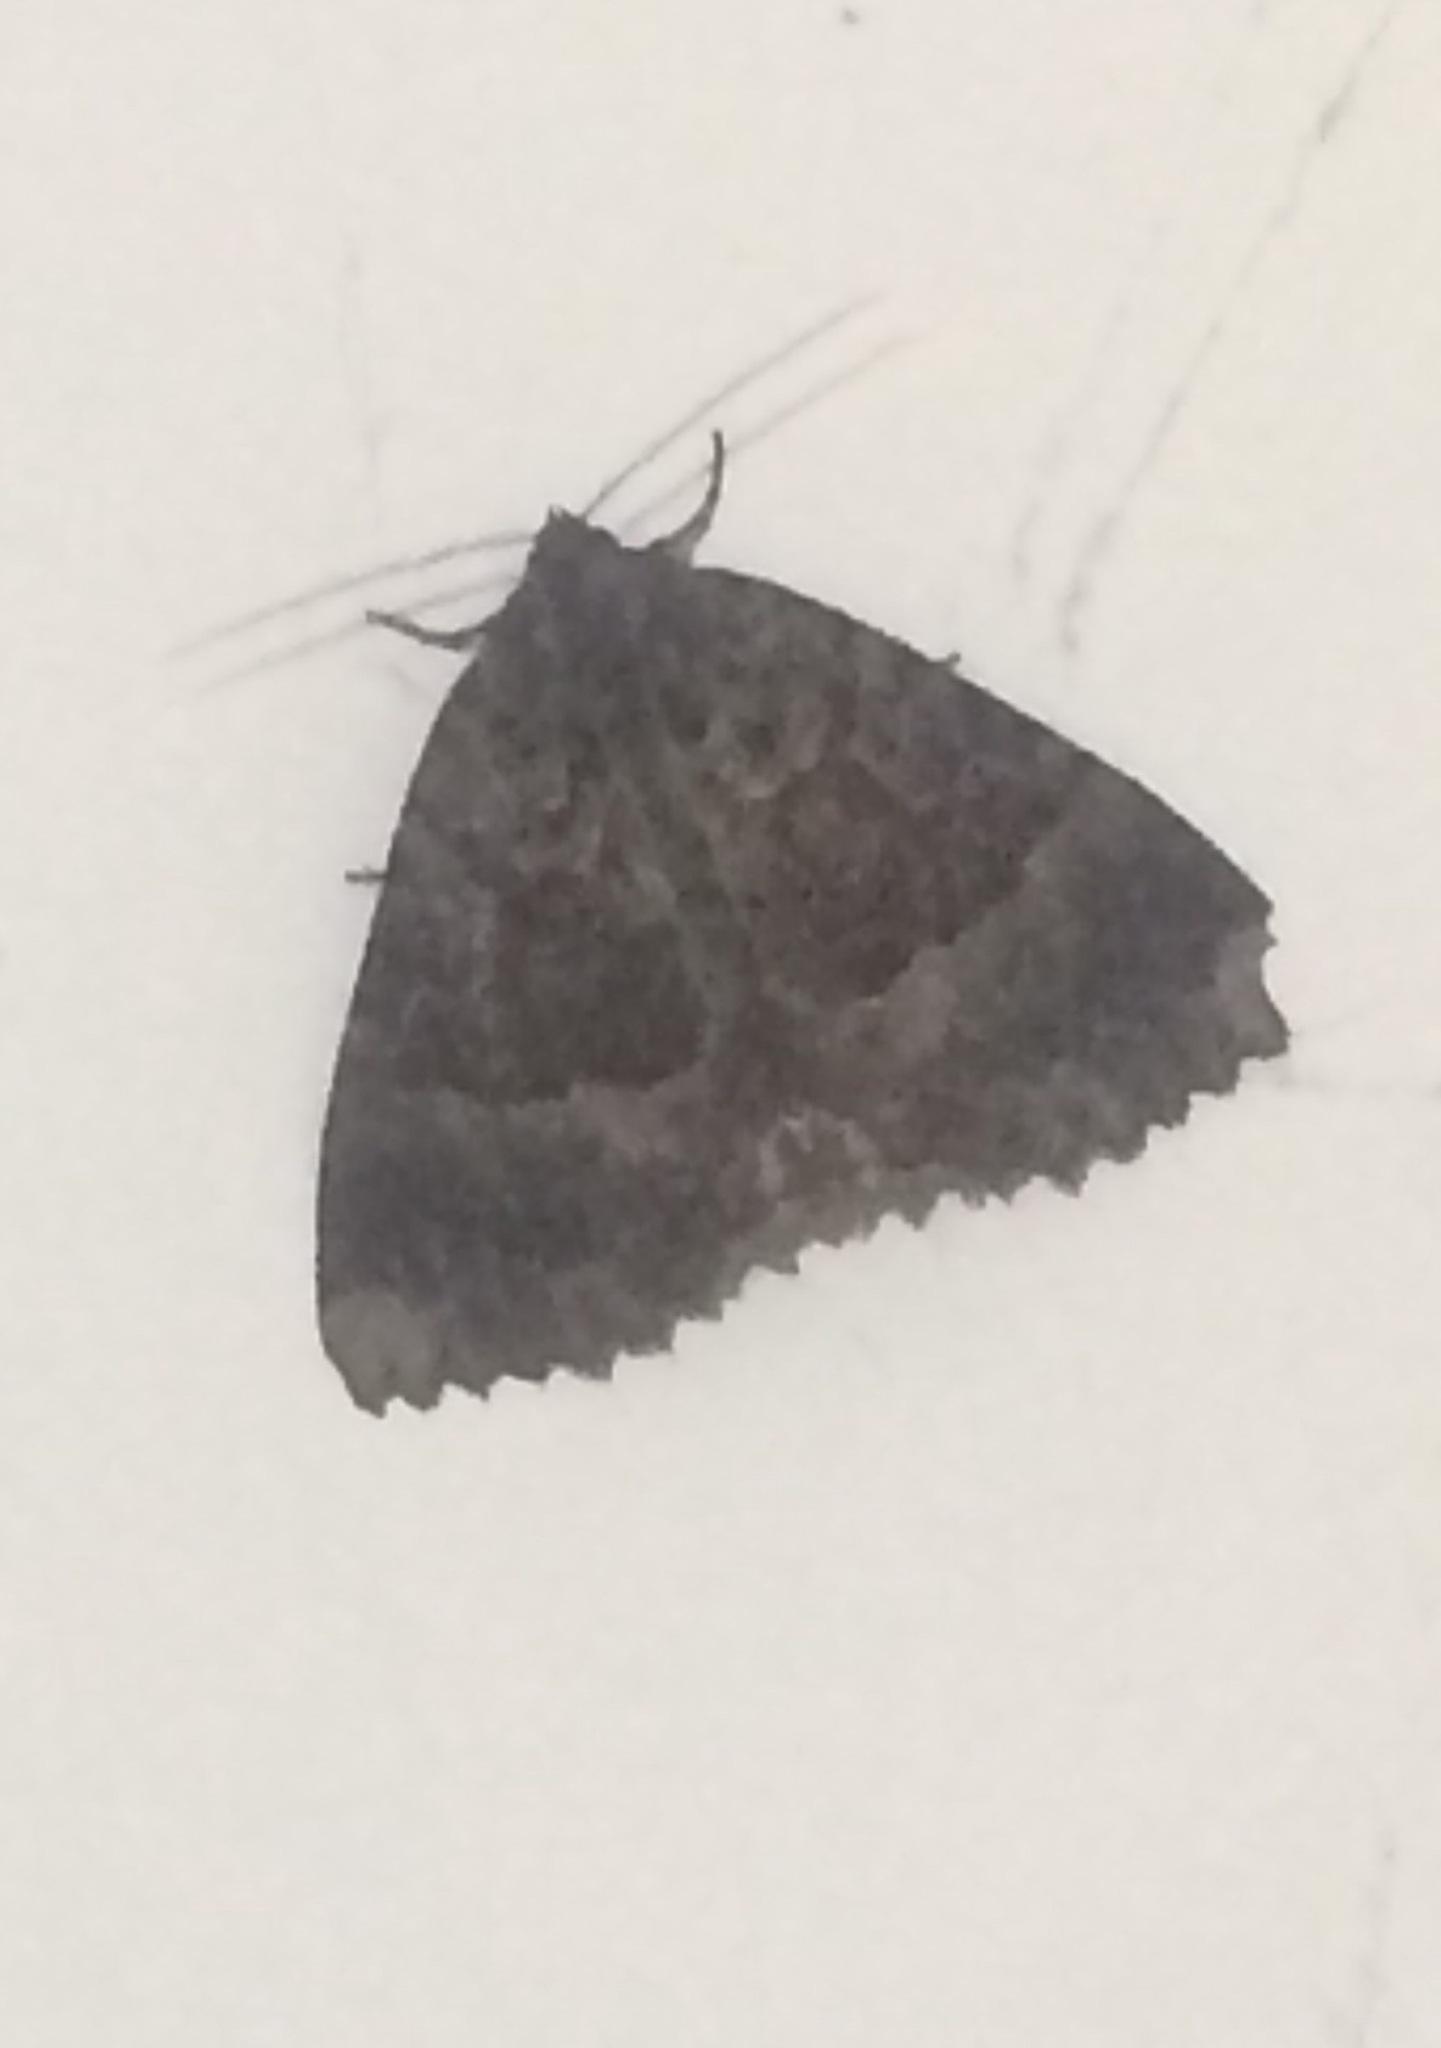 'Old Lady' Moth by HelenaM